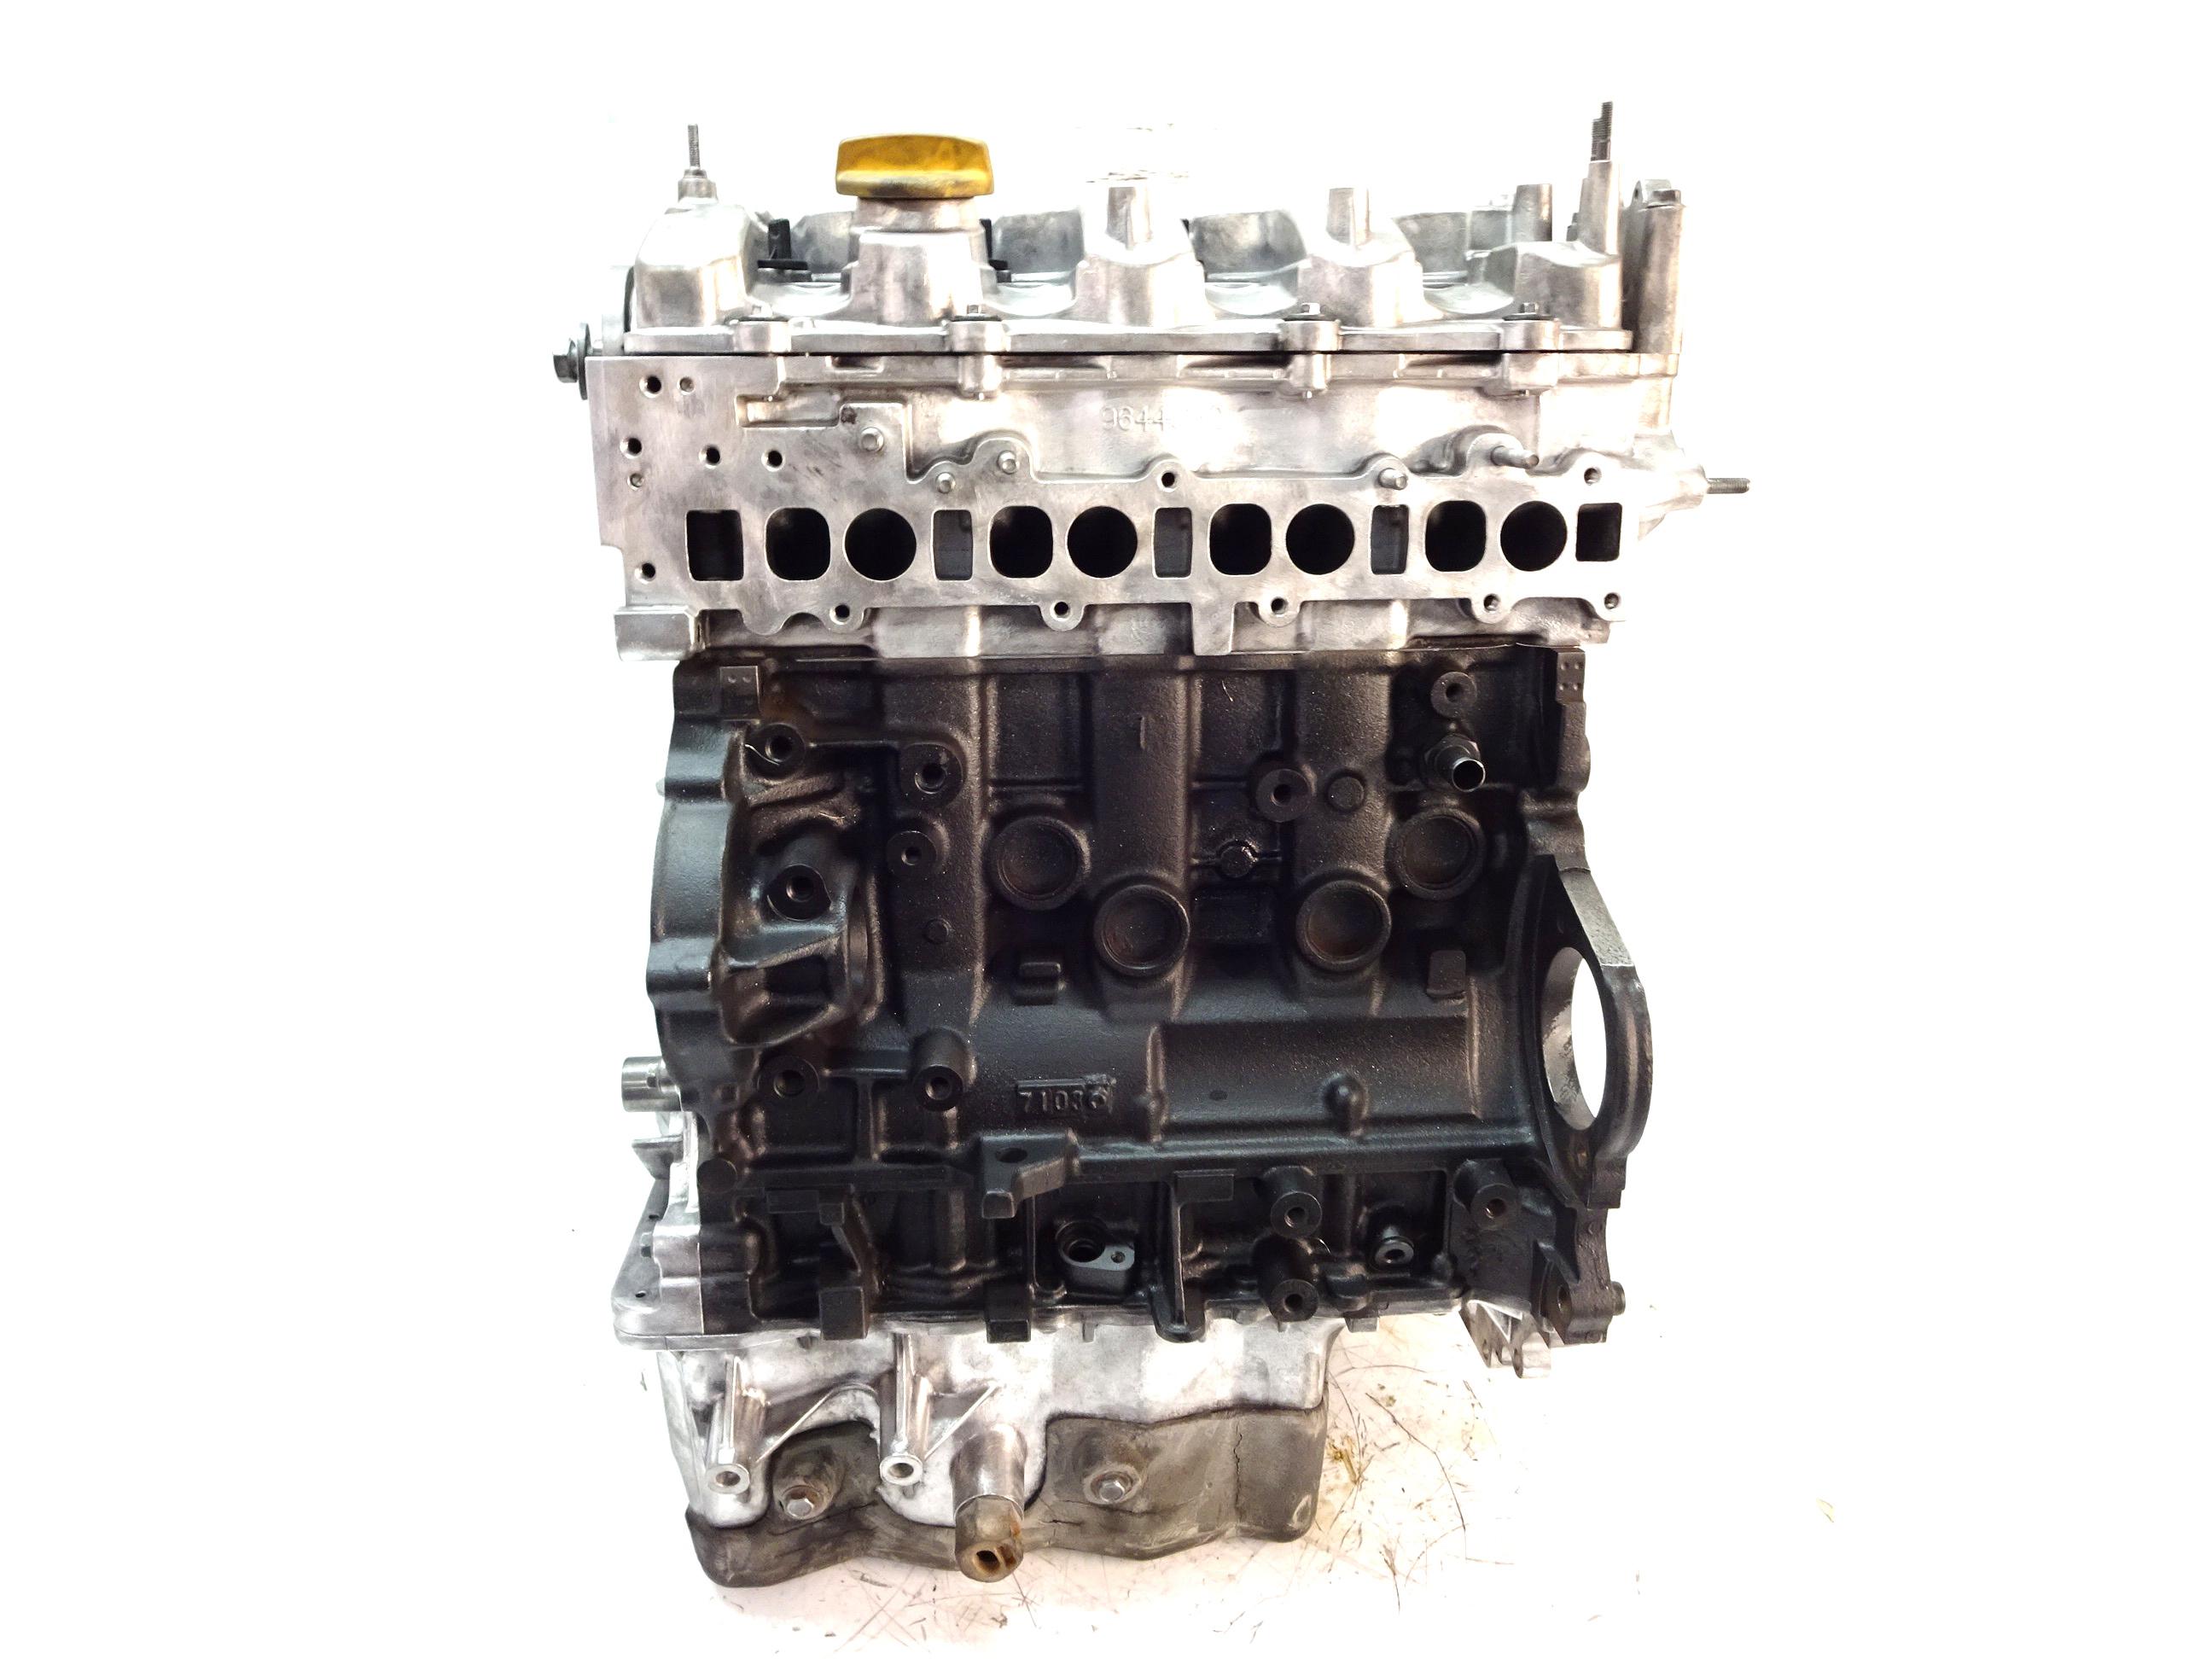 Motor Chevrolet Opel Cruze J300 Antara 2,0 CDTI Diesel Z20S1 Z20DMH DE321430